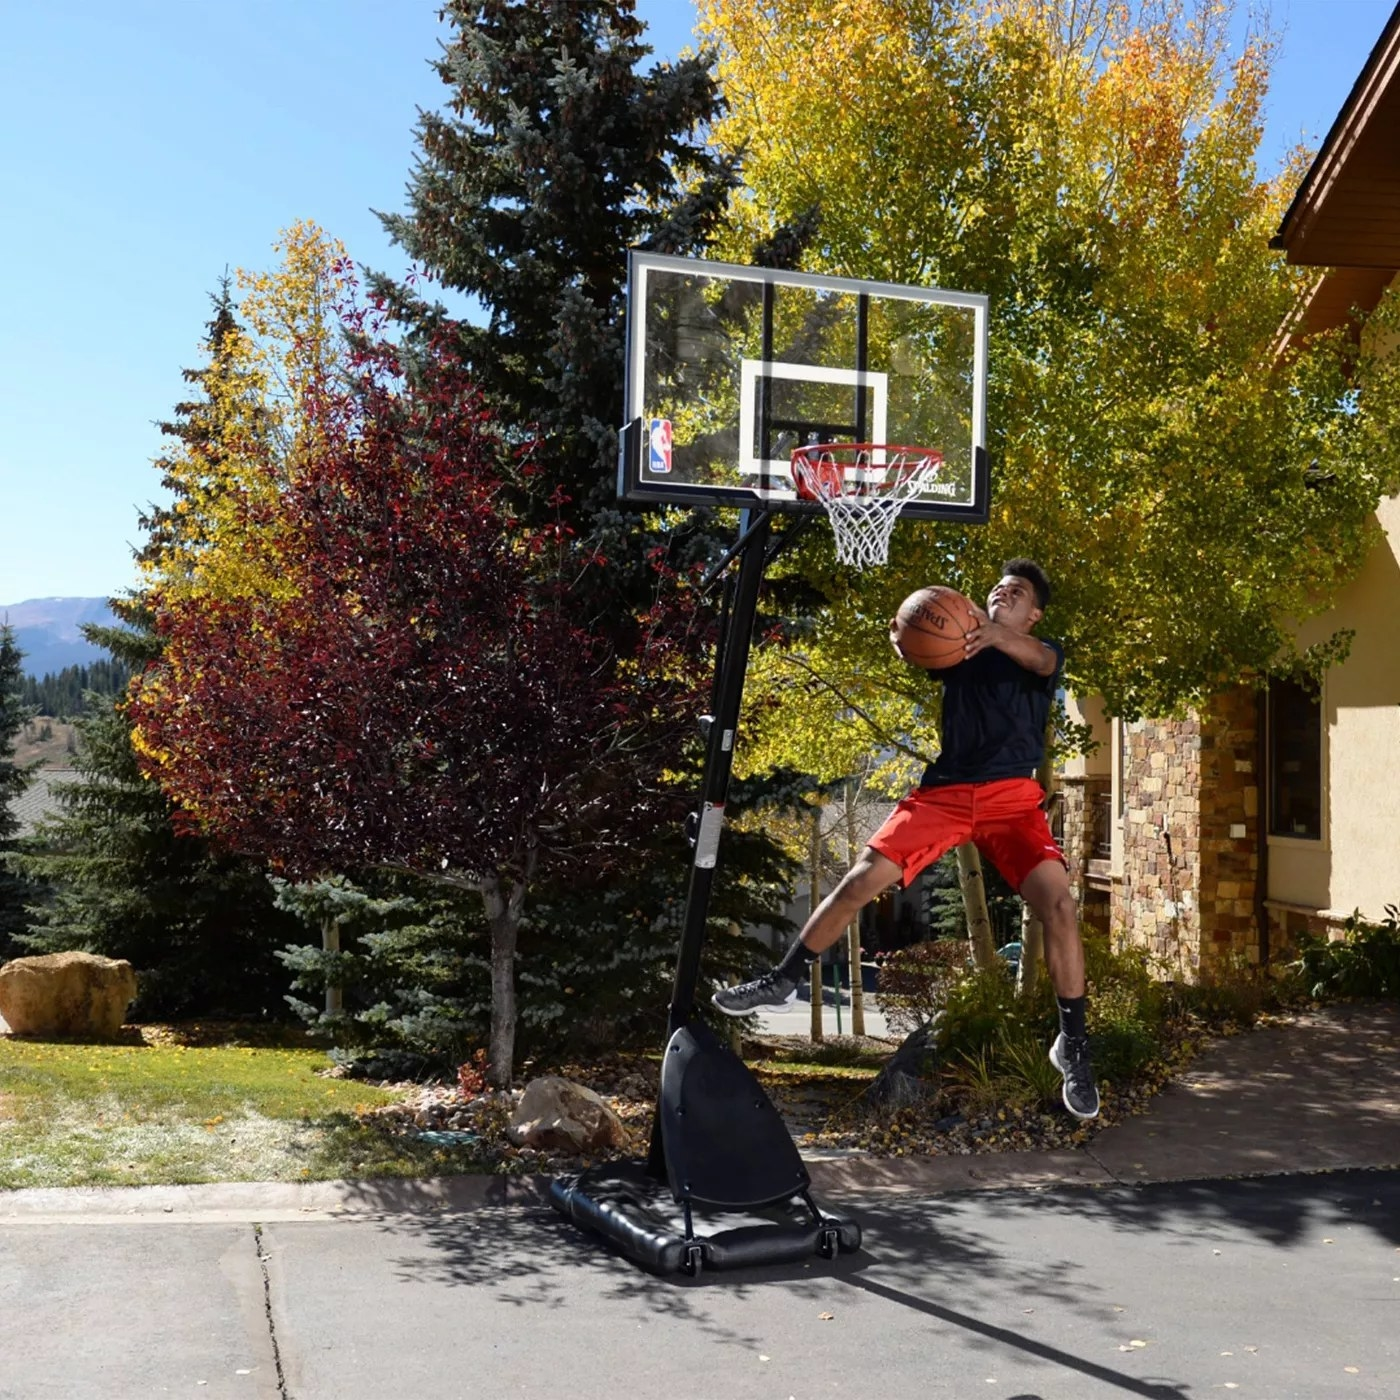 The Spalding NBA basketball hoop